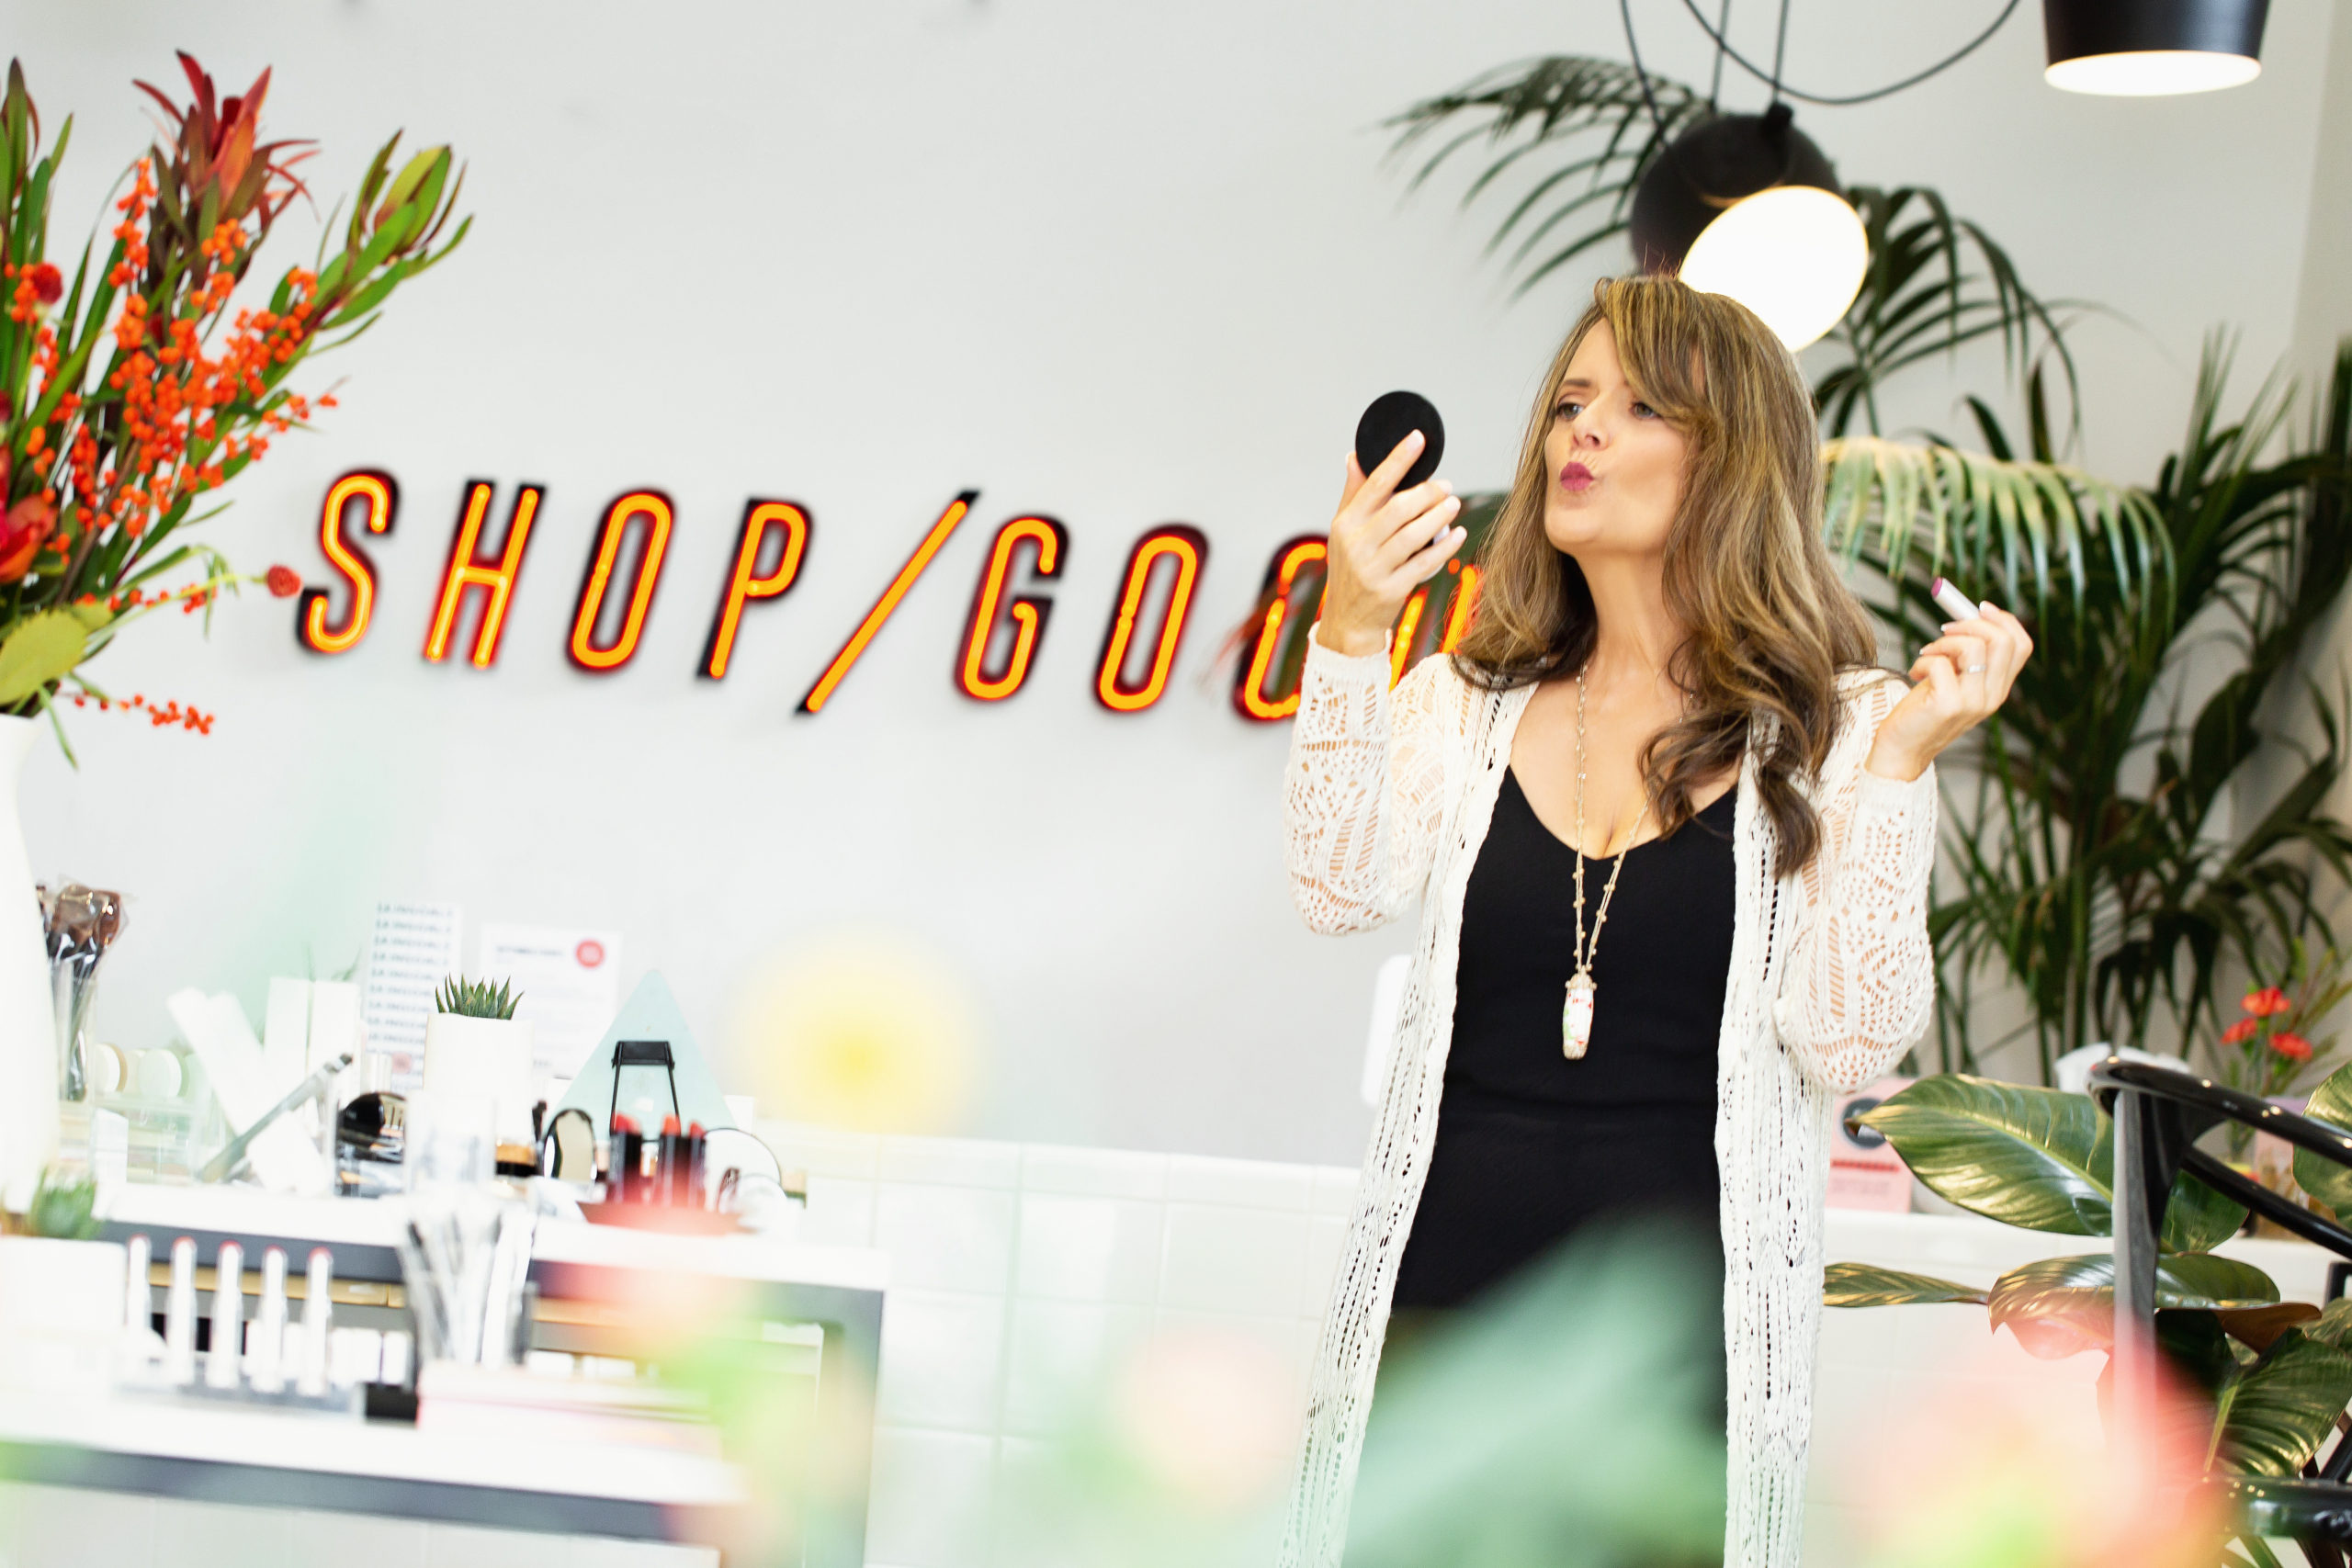 San Diego's Shop/Good natural cosmetics